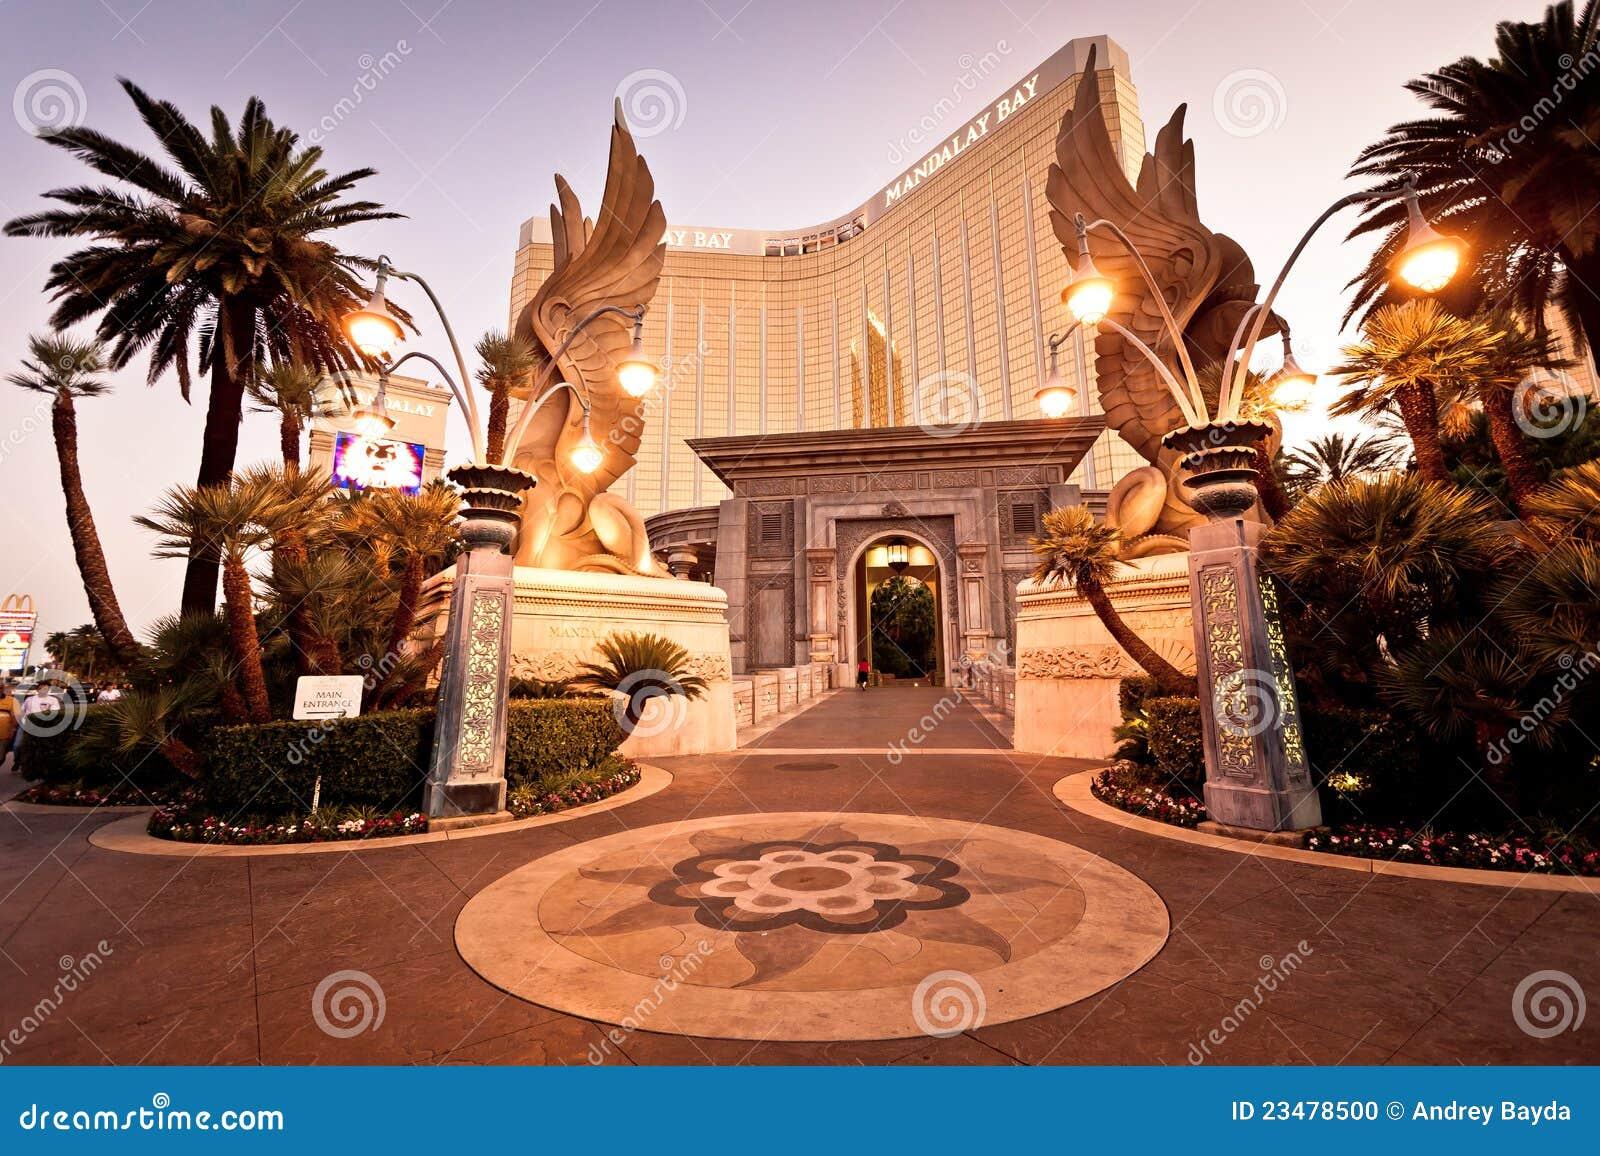 10 Unsolved Casino Mysteries  Listverse